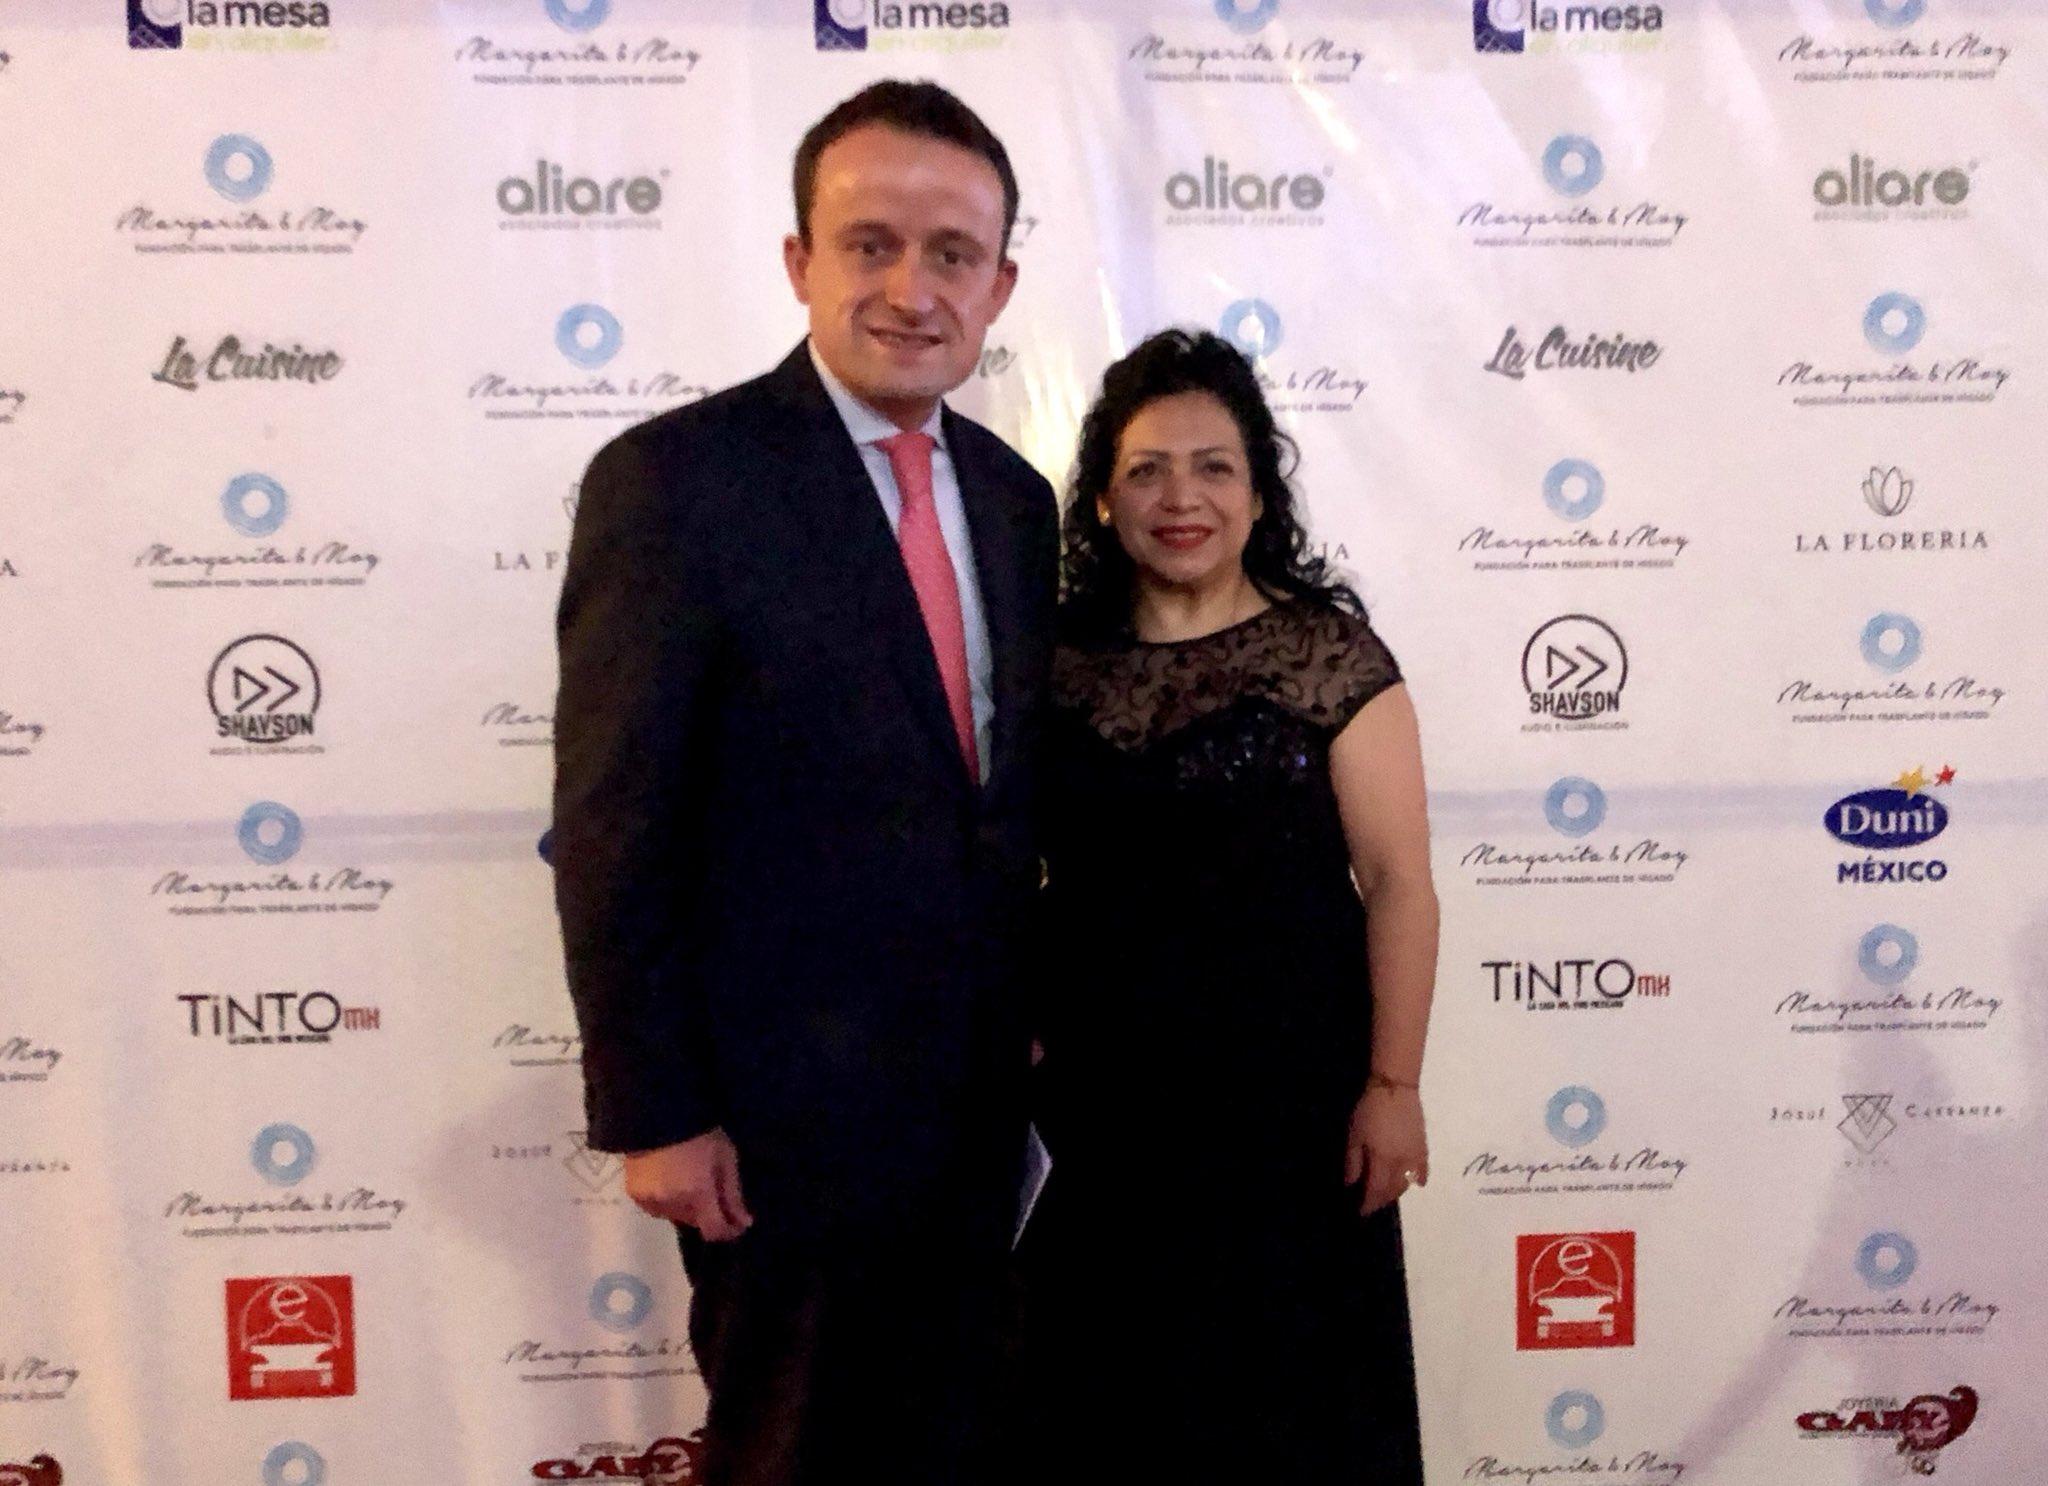 Arribo con mucho gusto a presentación oficial de #MargaritayMoy, Fundación para el #TrasplanteDeHígado https://t.co/oHuxtZVpgd